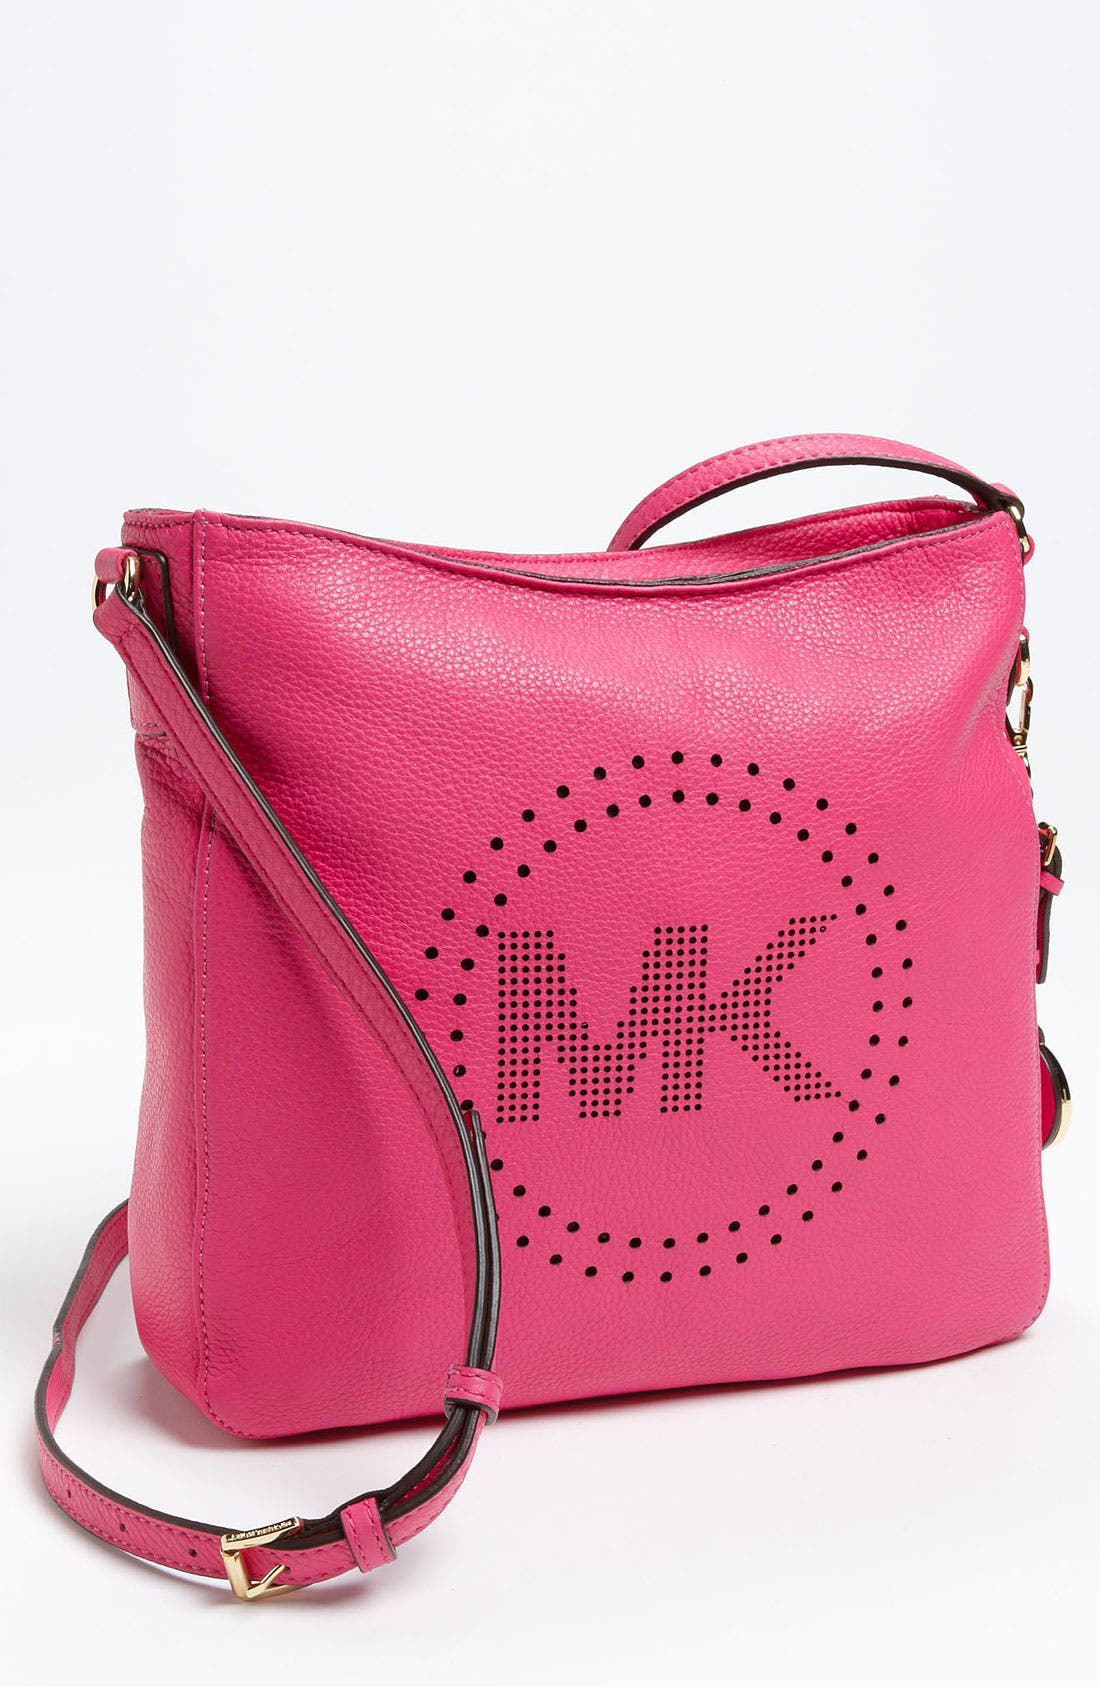 Main Image - MICHAEL Michael Kors 'Perforated MK - Large' Leather Messenger Bag